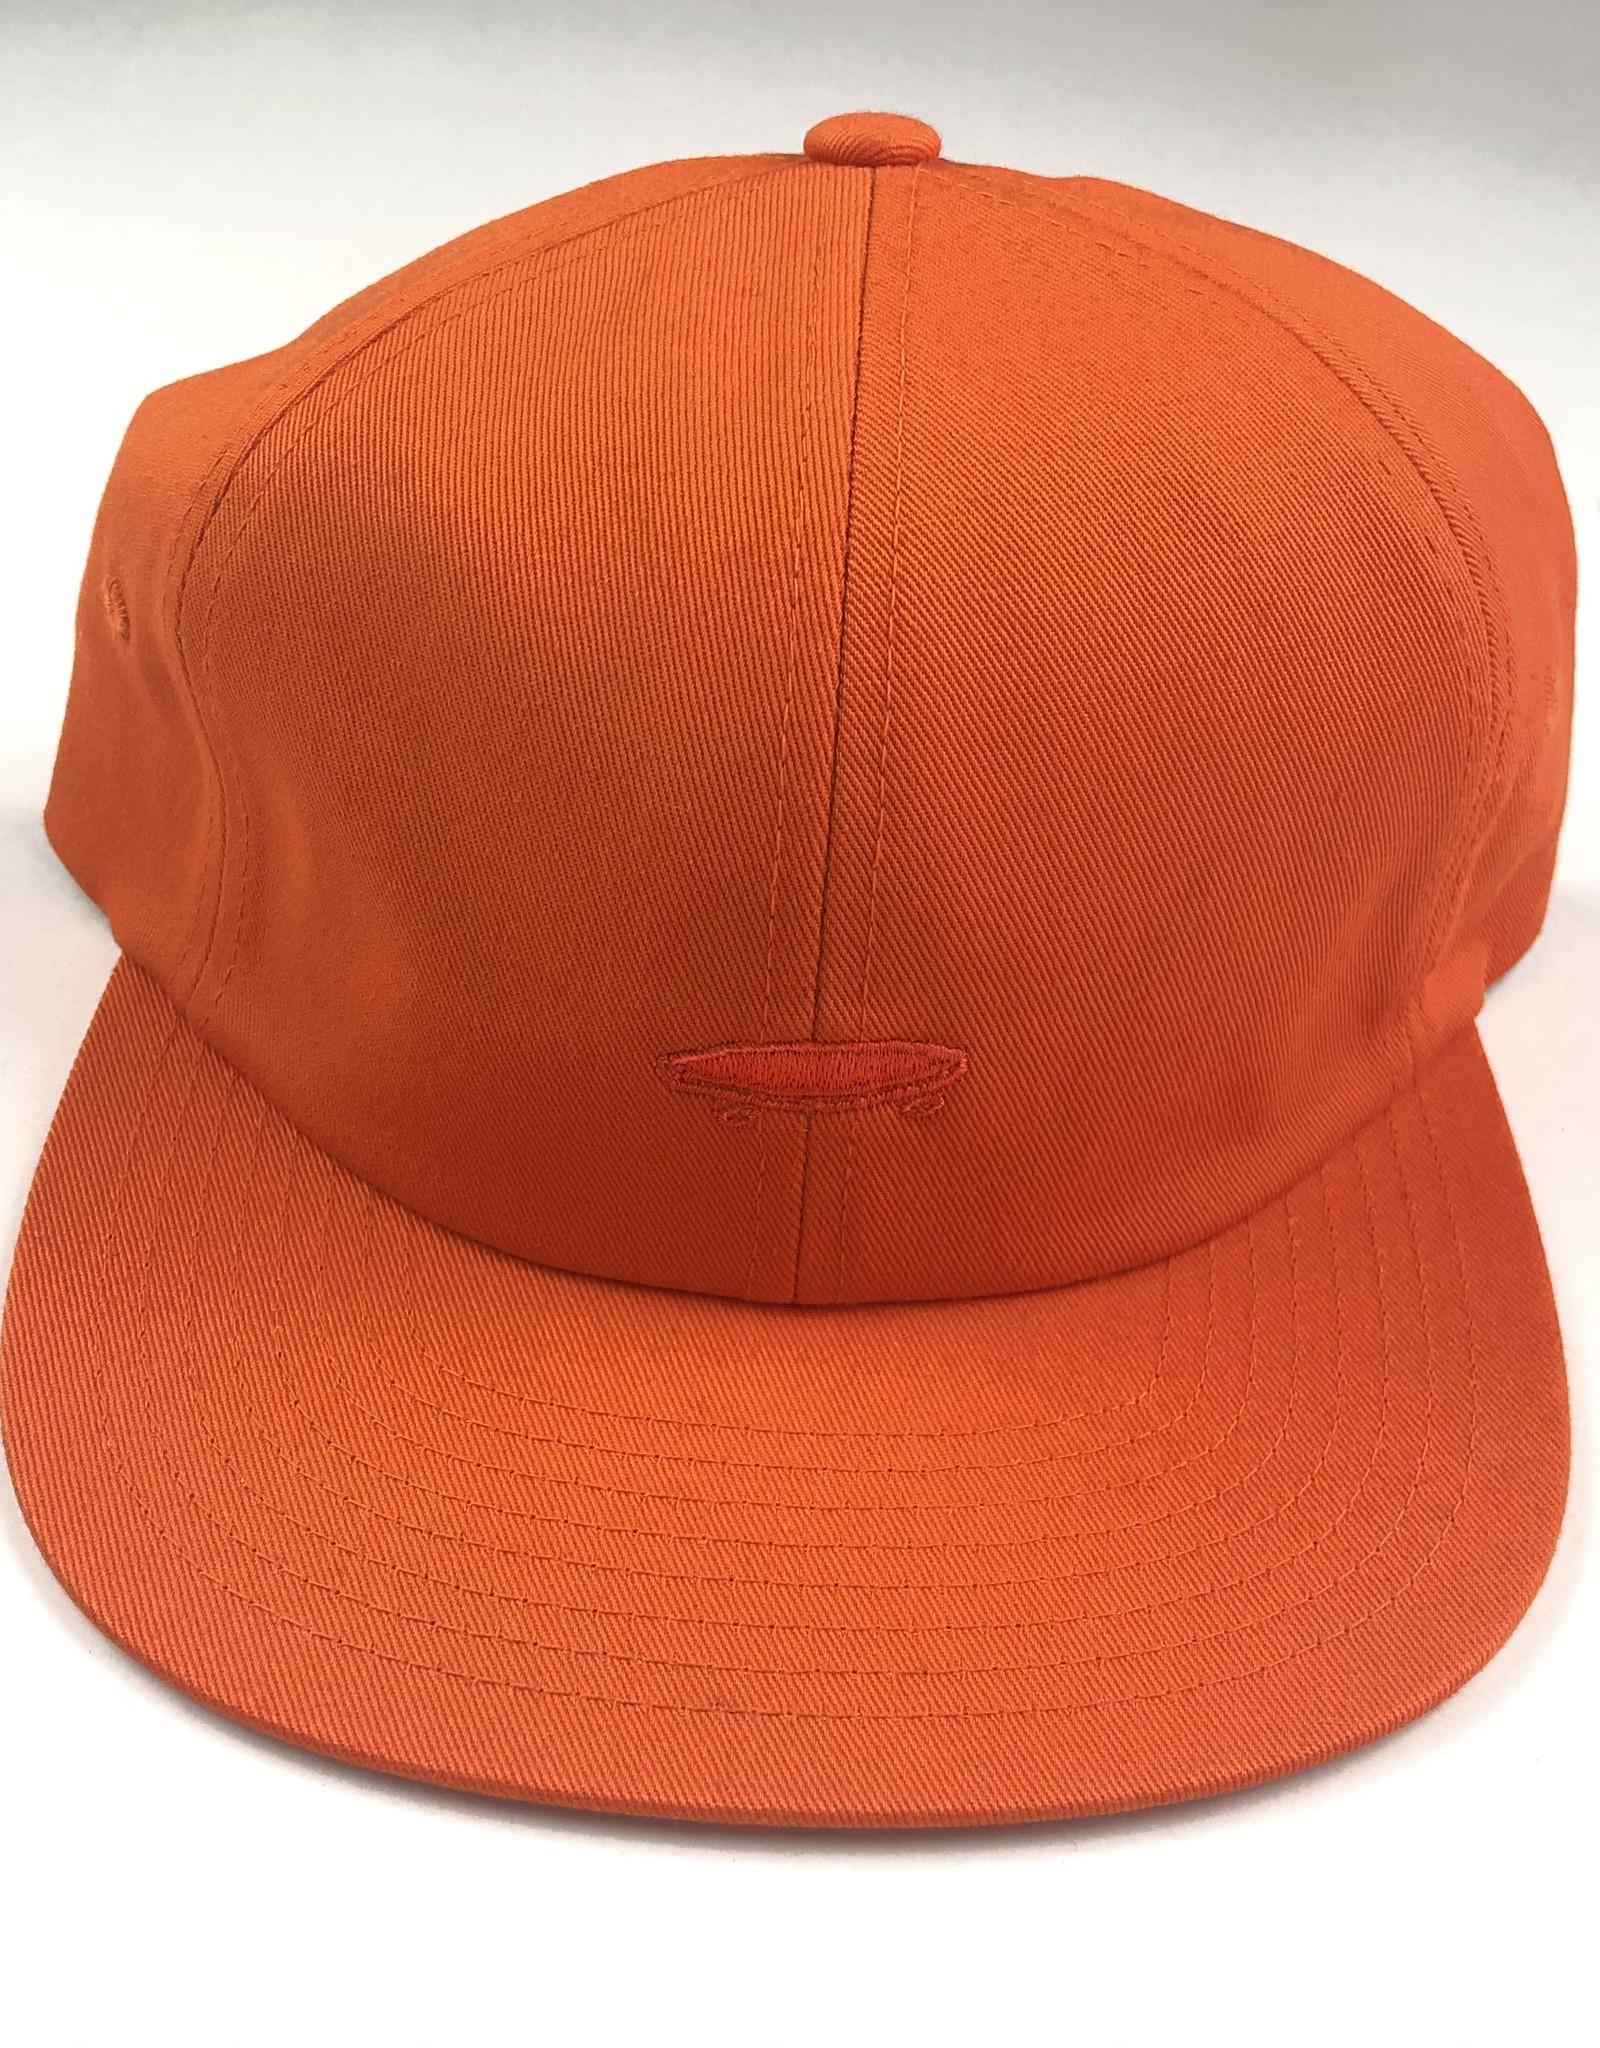 VANS VANS SALTON 2 HAT - FLAME